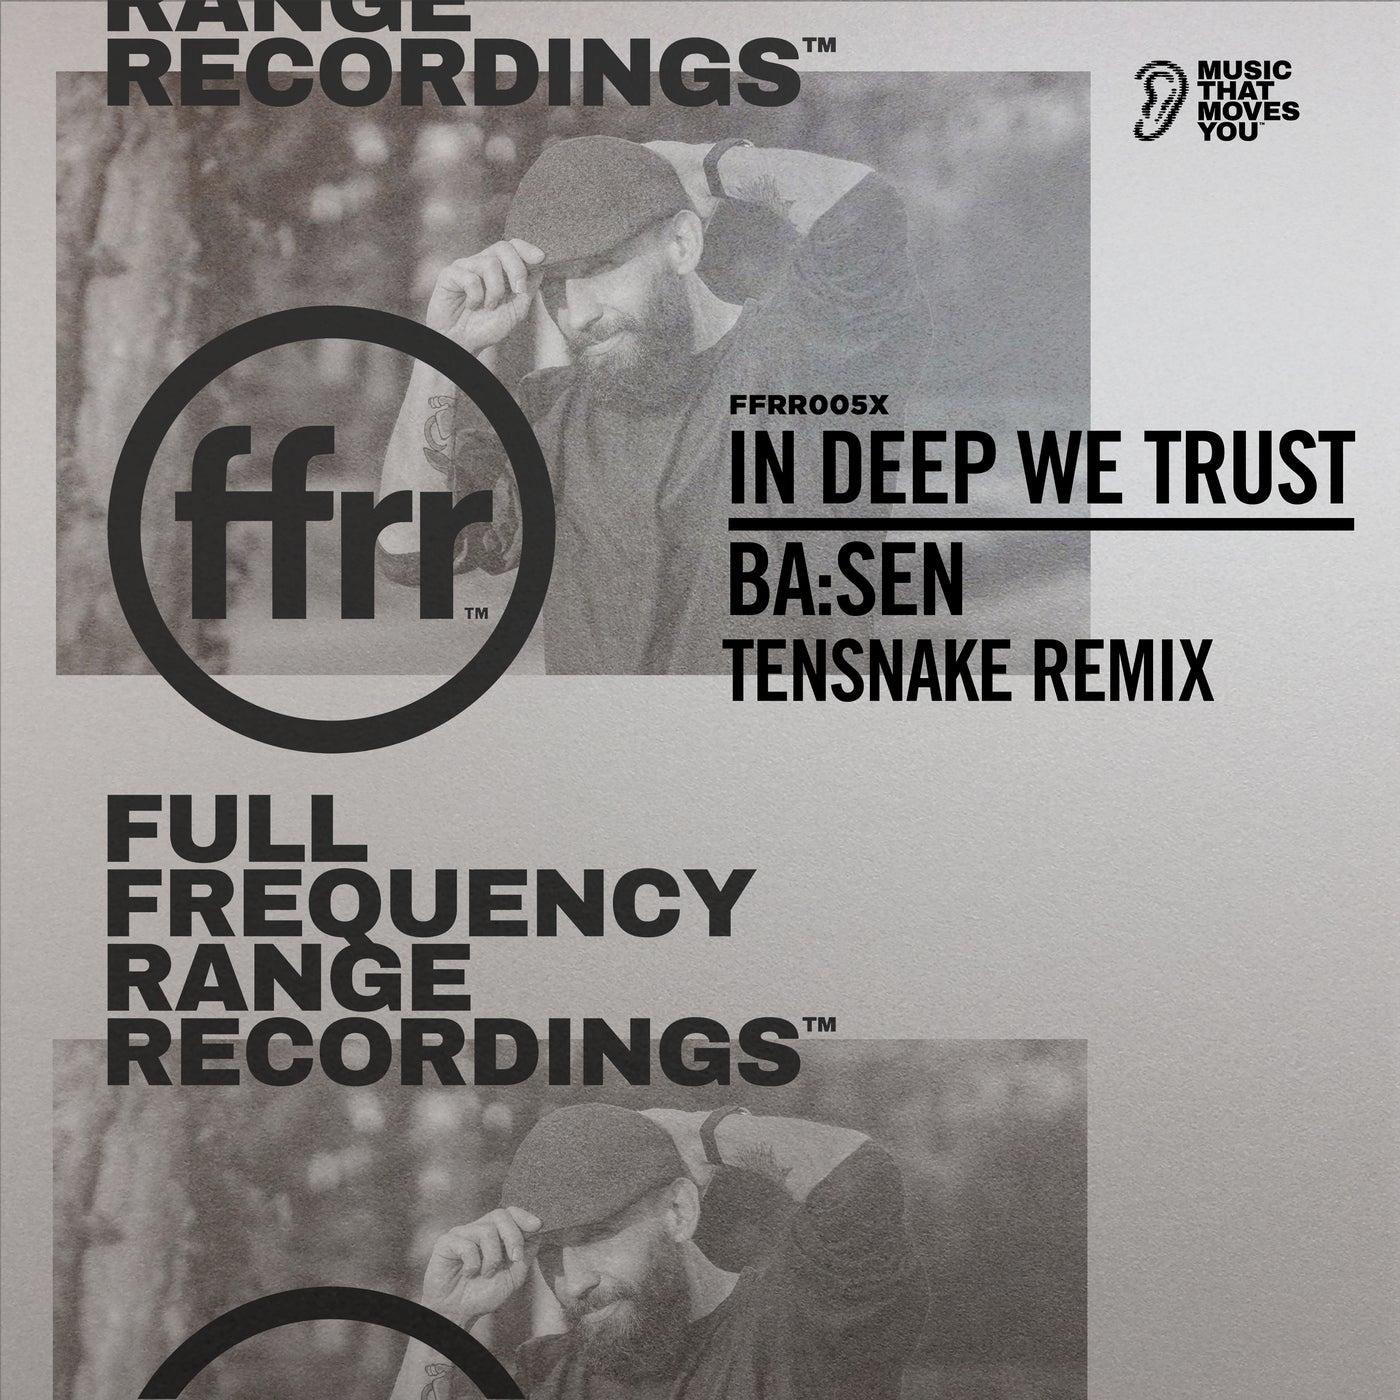 Ba:sen (Tensnake Extended Remix)